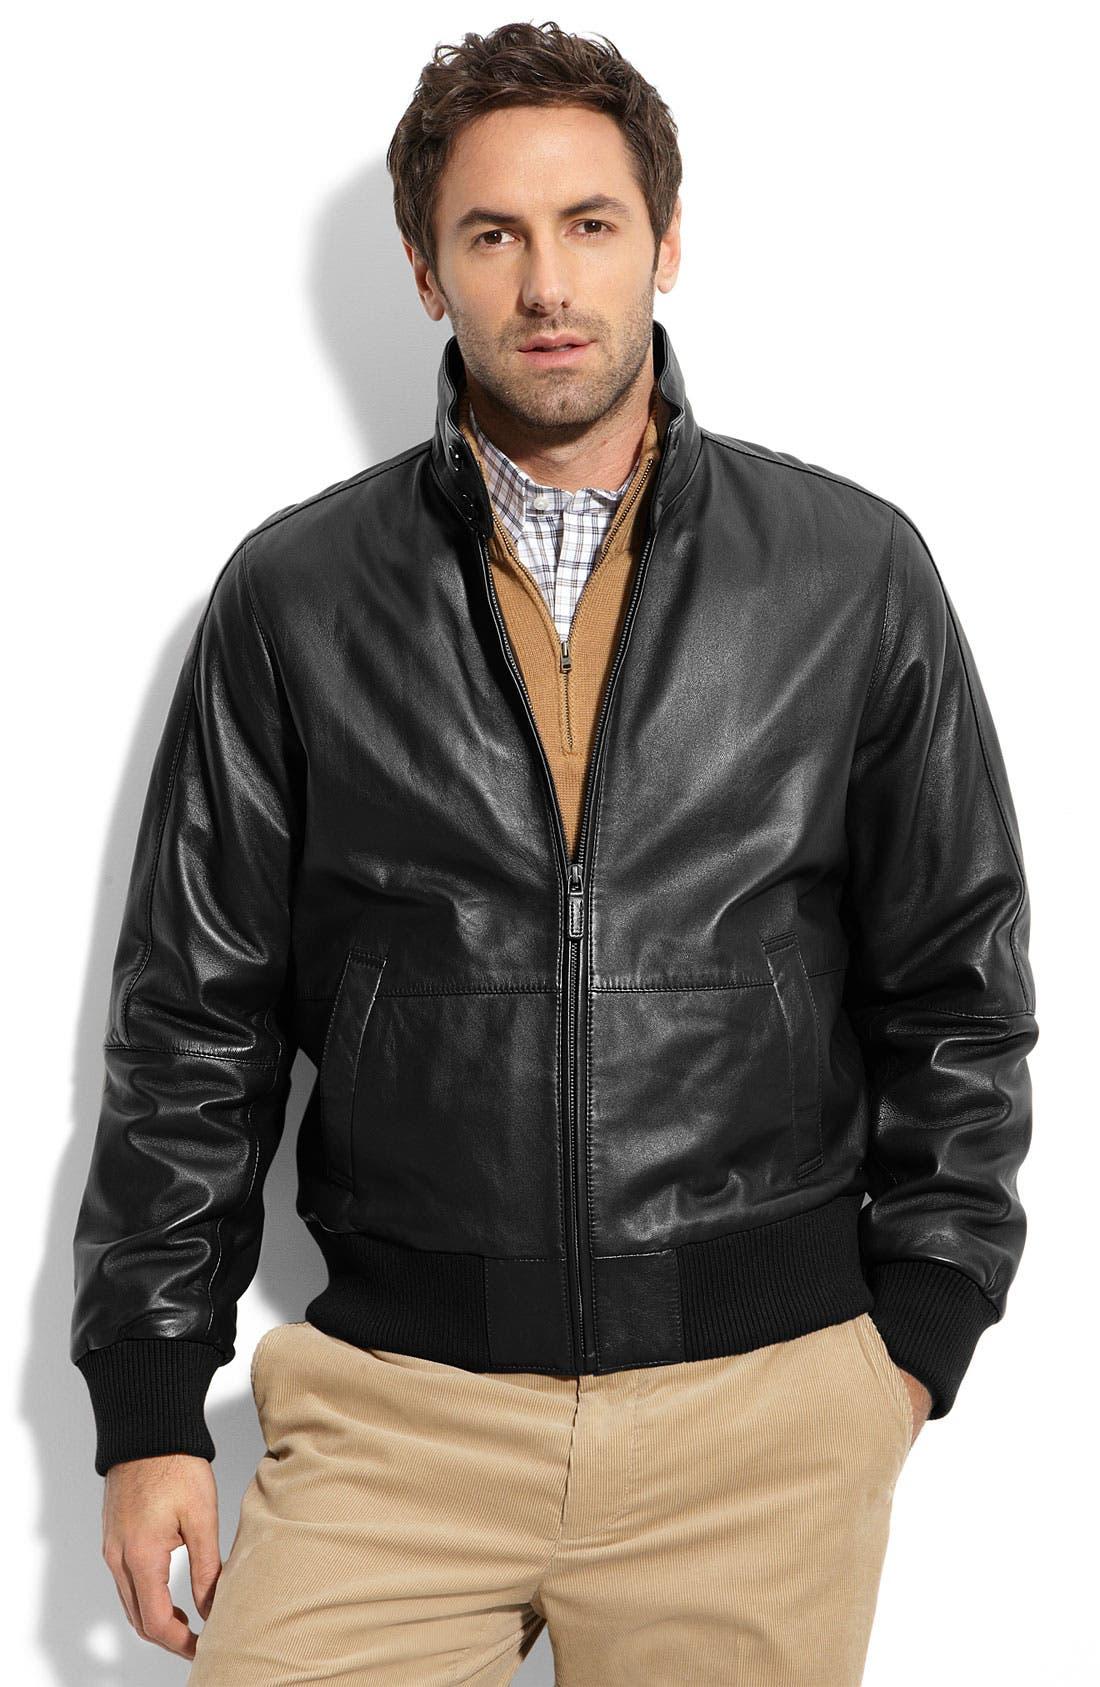 F. FAÇONNABLE Façonnable Lambskin Leather Blouson Jacket, Main, color, 001